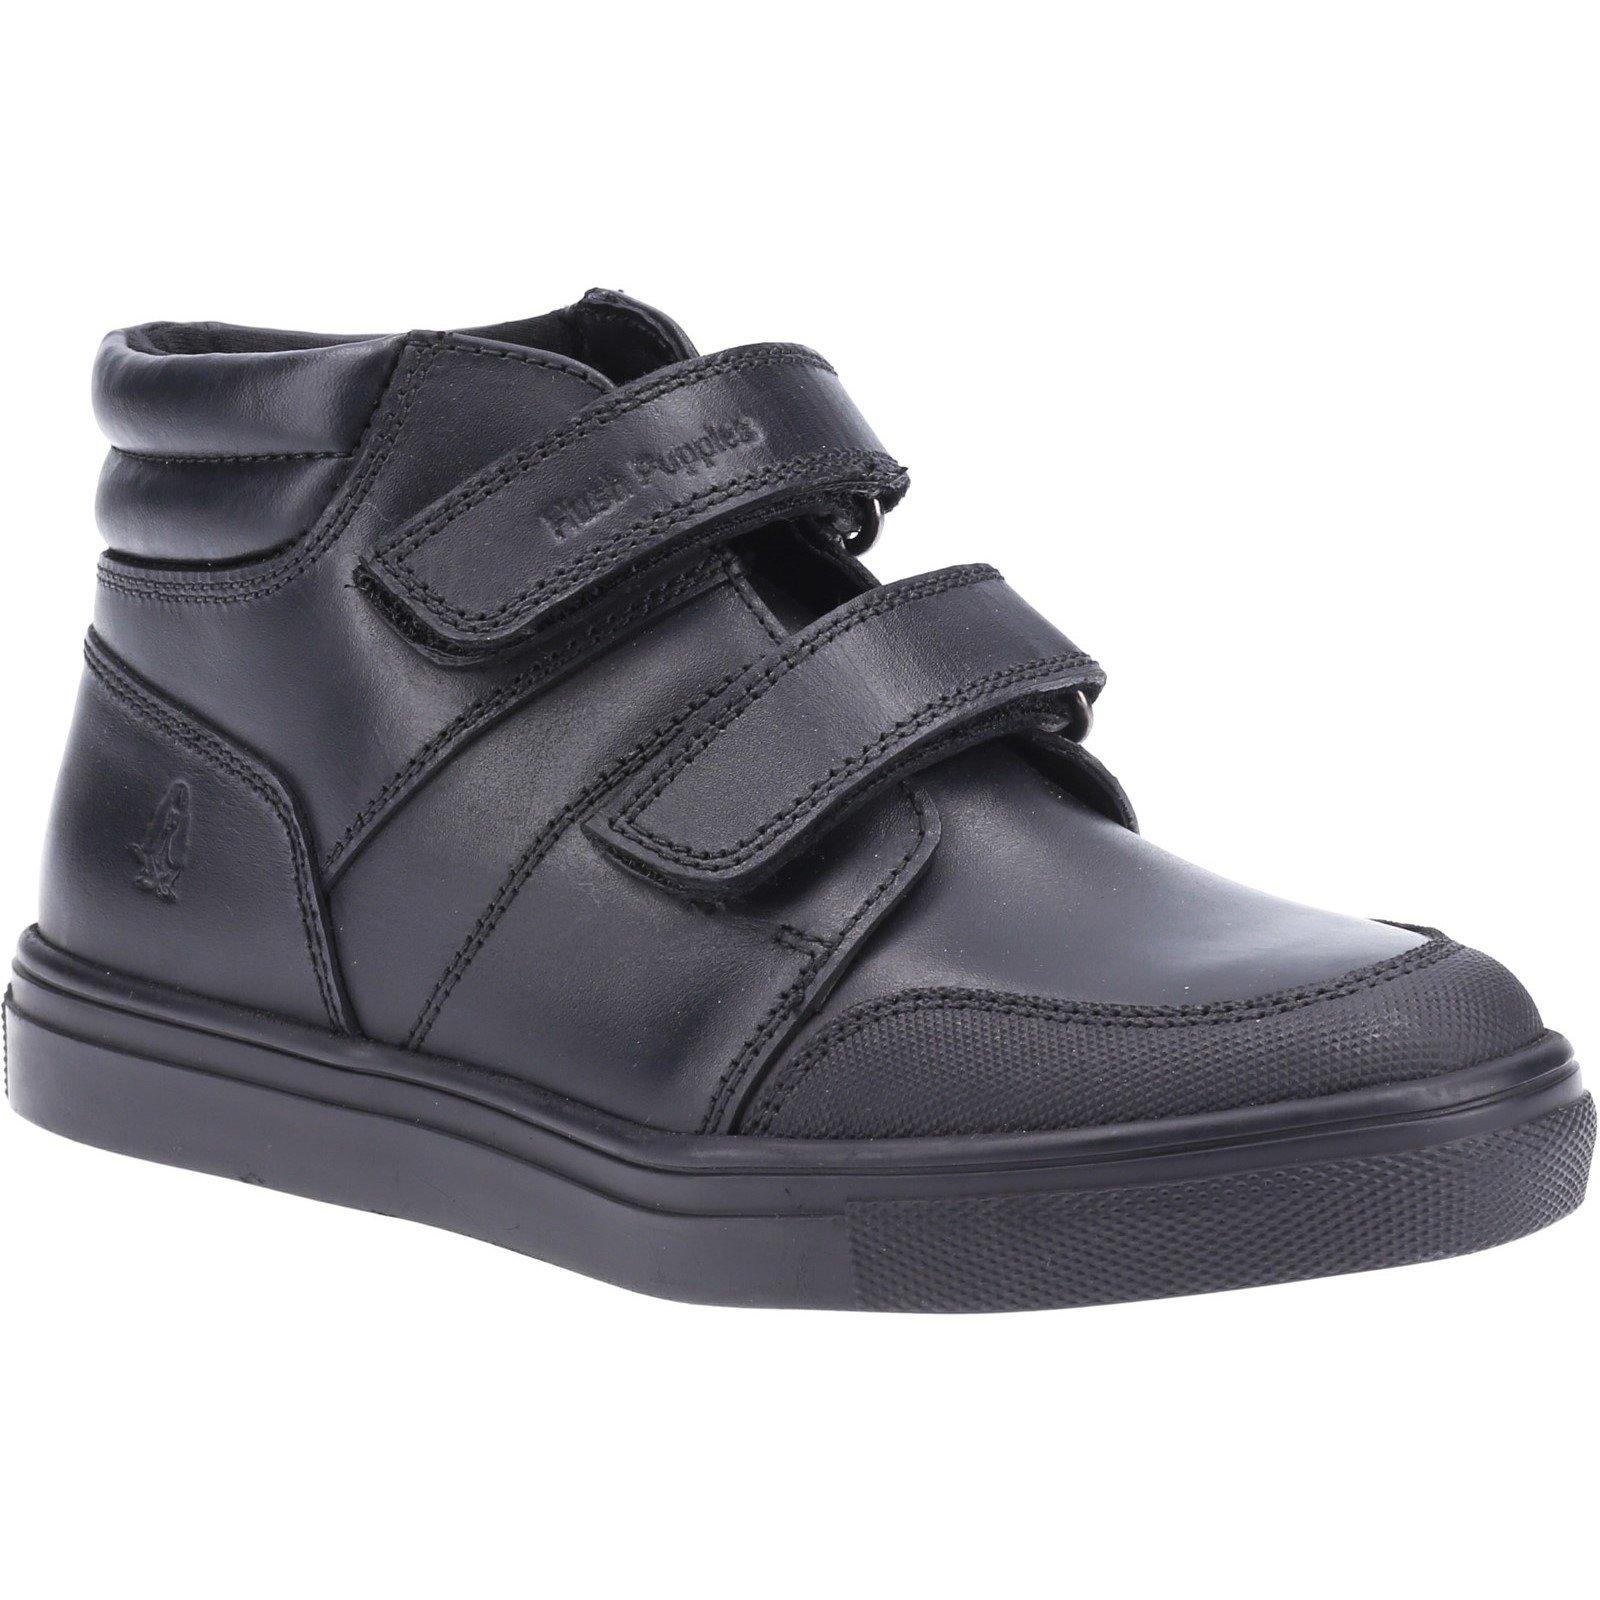 Hush Puppies Kid's Seth Junior Boot Black 32570 - Black 10